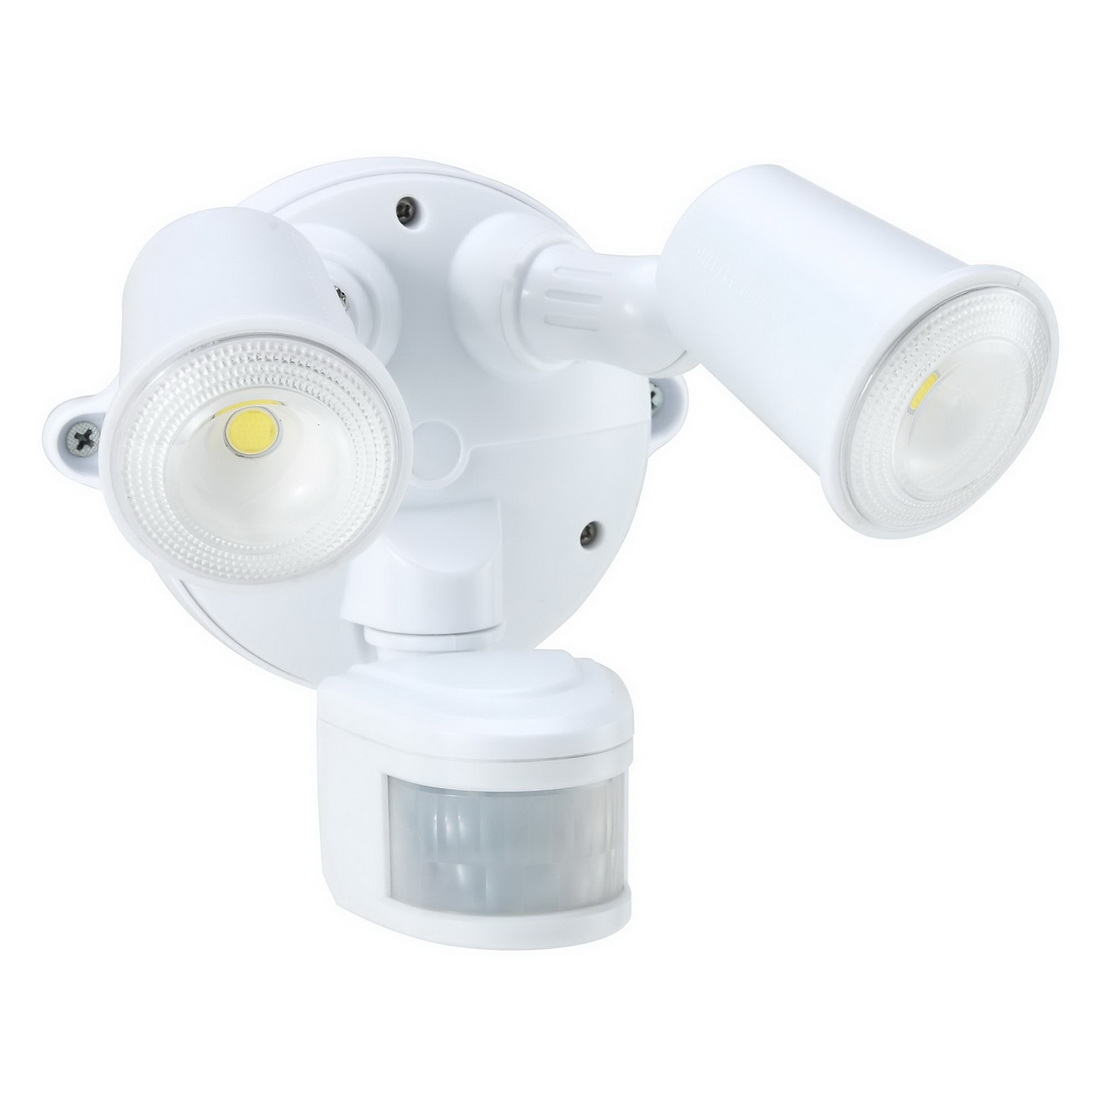 2x10W 100-240V 2000lm 5000K Twin LED Spotlight with Motion Sensor White IP54